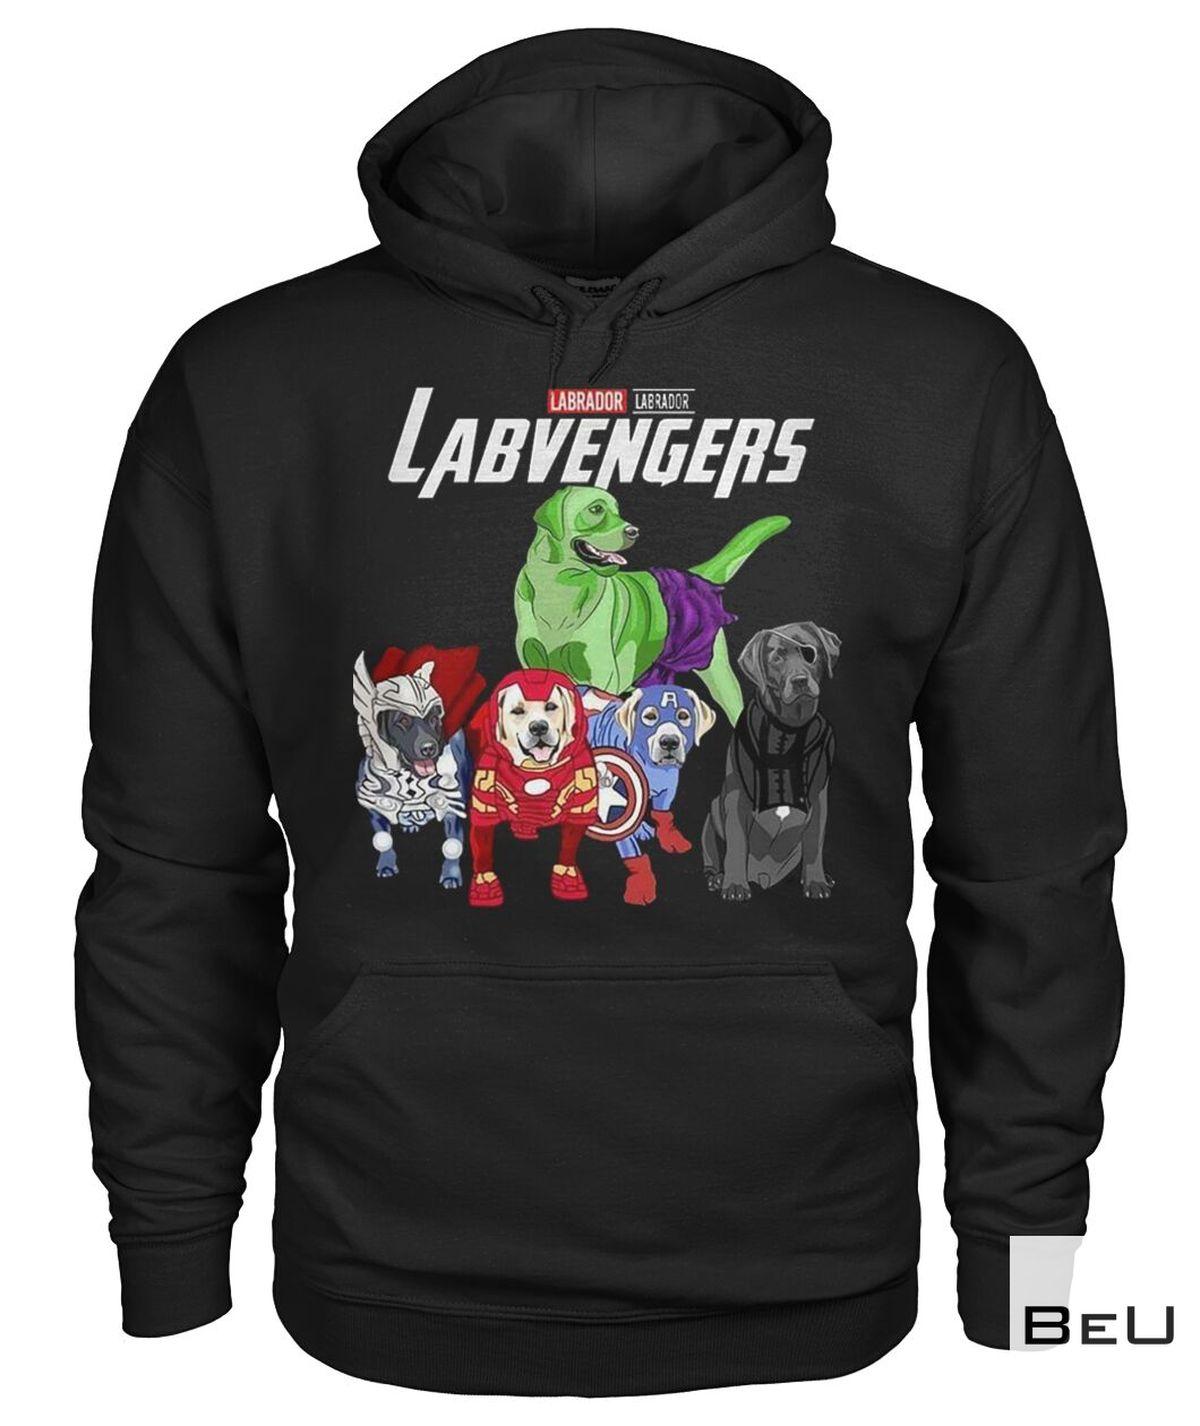 Labrador Labvengers Avengers Shirtz